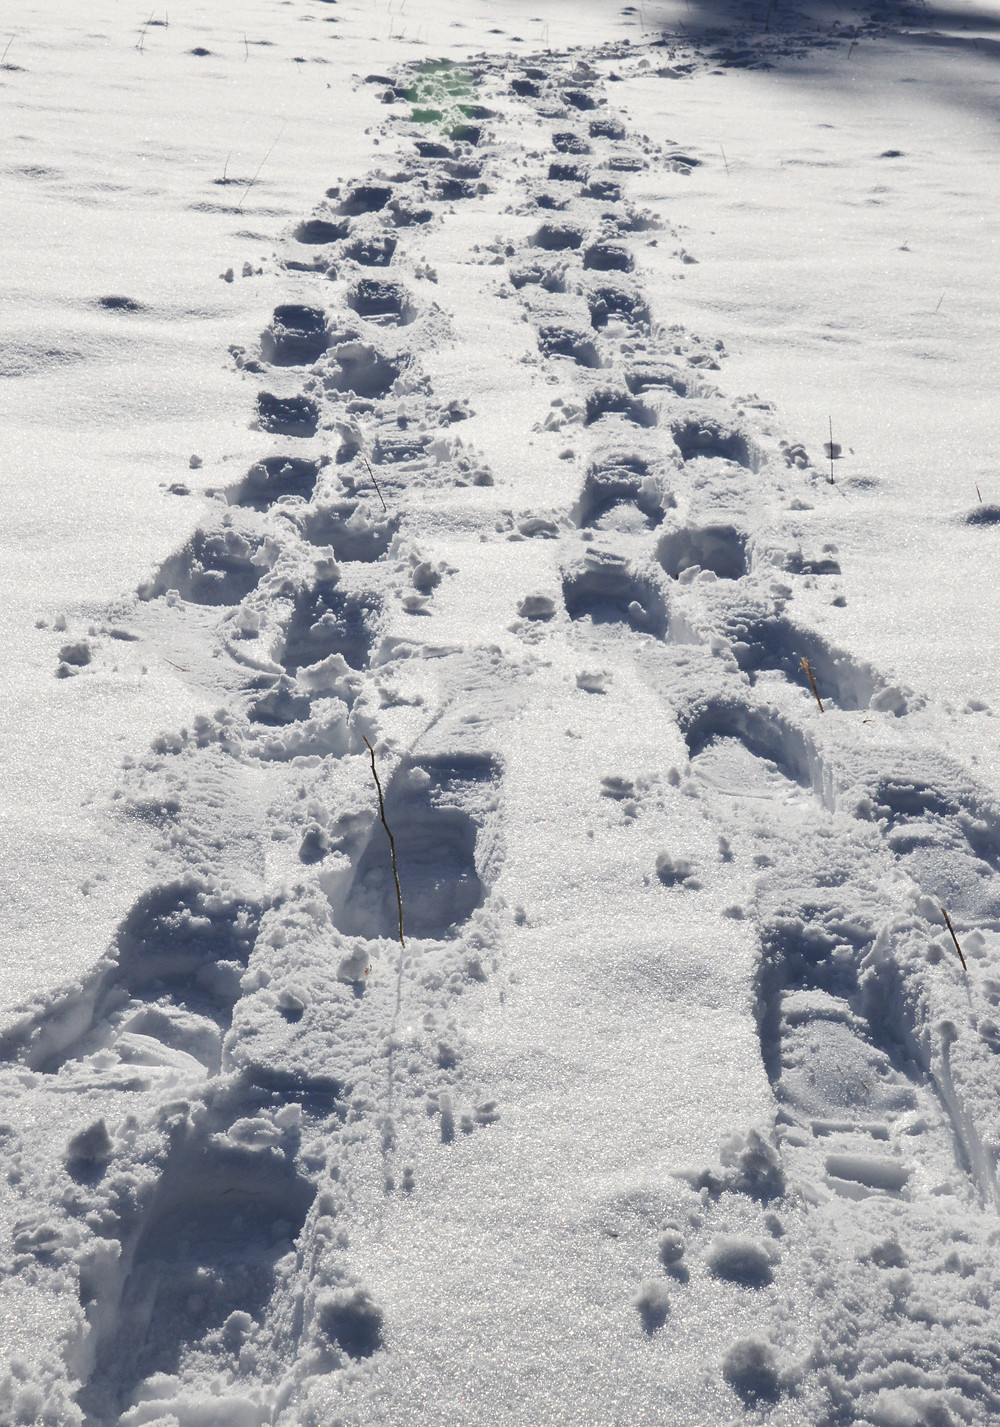 Snowshoe track in fresh fallen snow